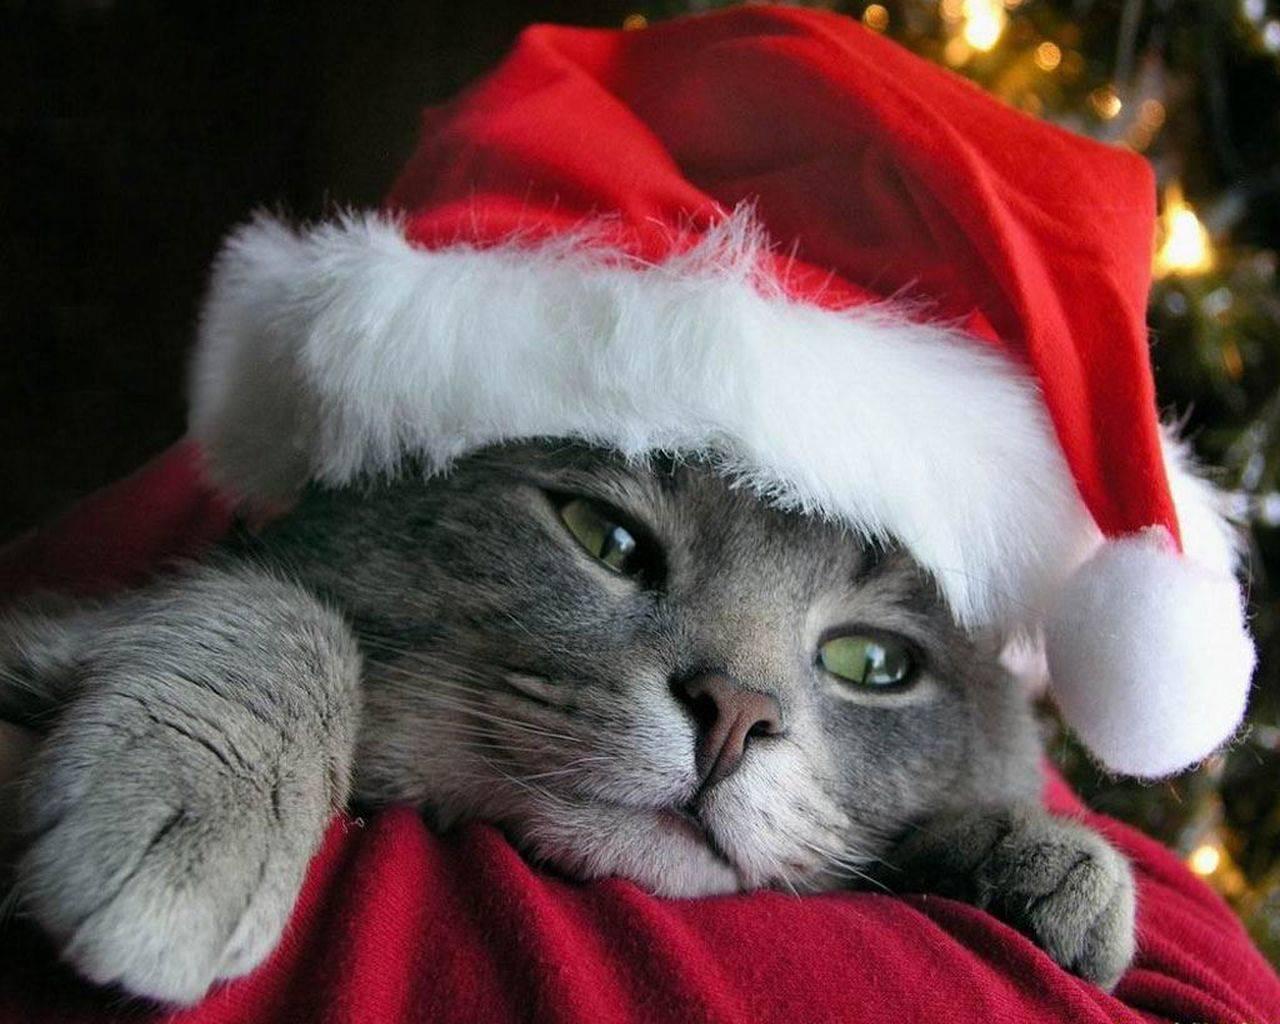 Merry Christmas From the Whole Katzenworld Team